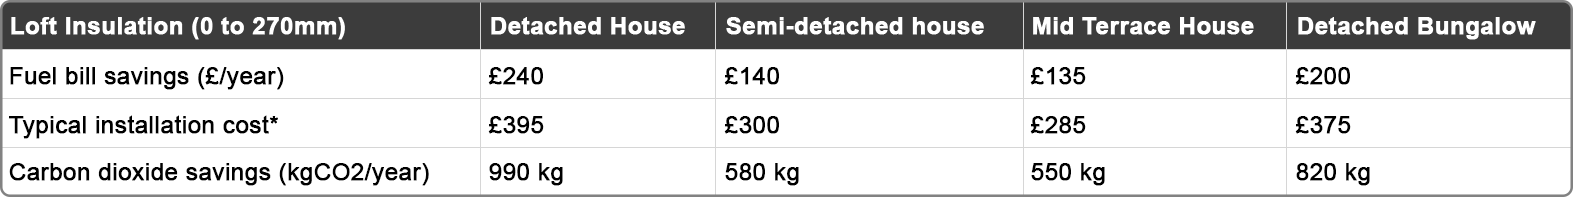 insulation_savings_table